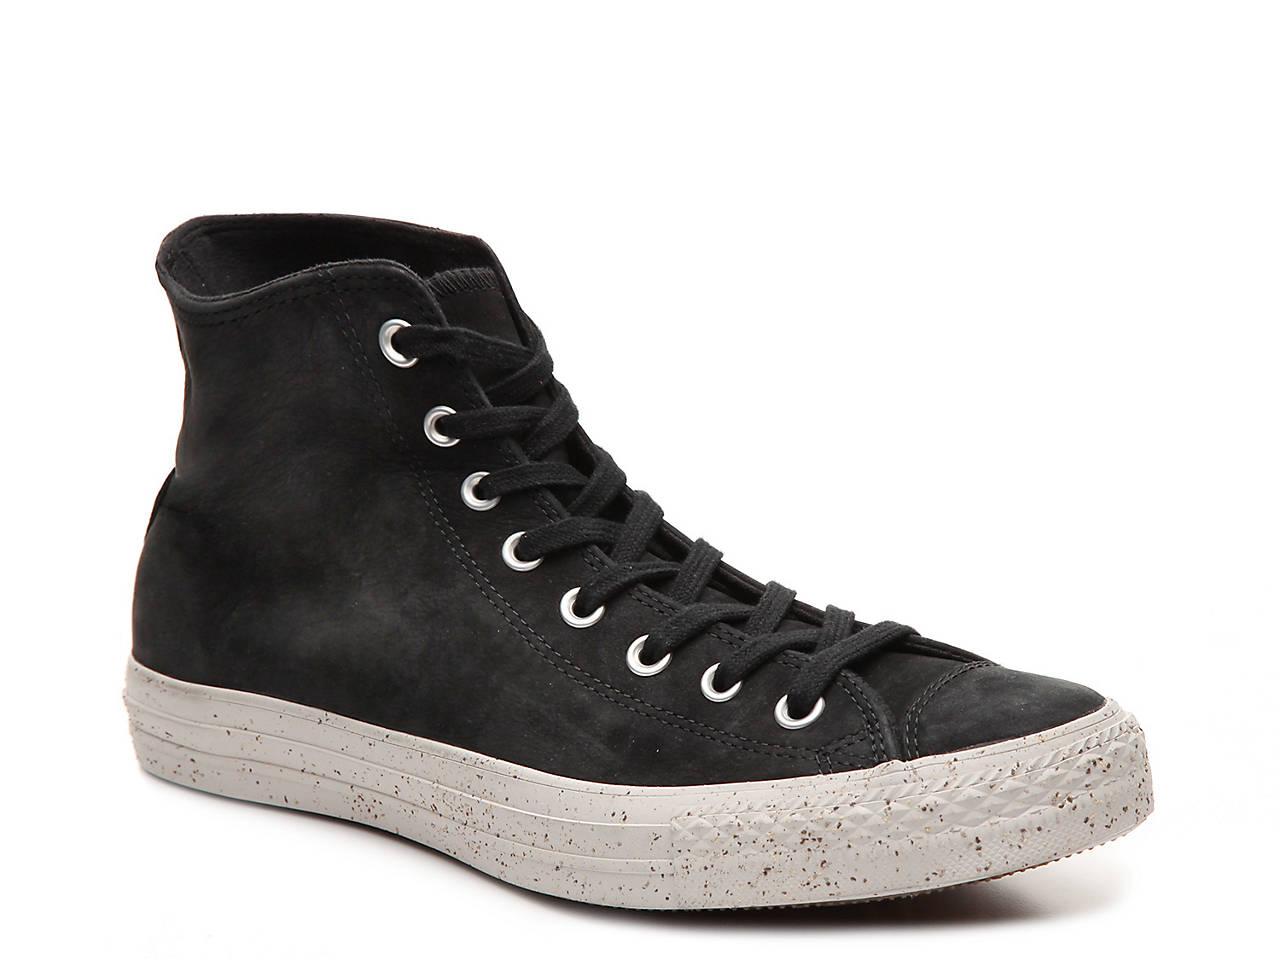 1655c9e3b90 Chuck Taylor All Star Nubuck High-Top Sneaker - Men s